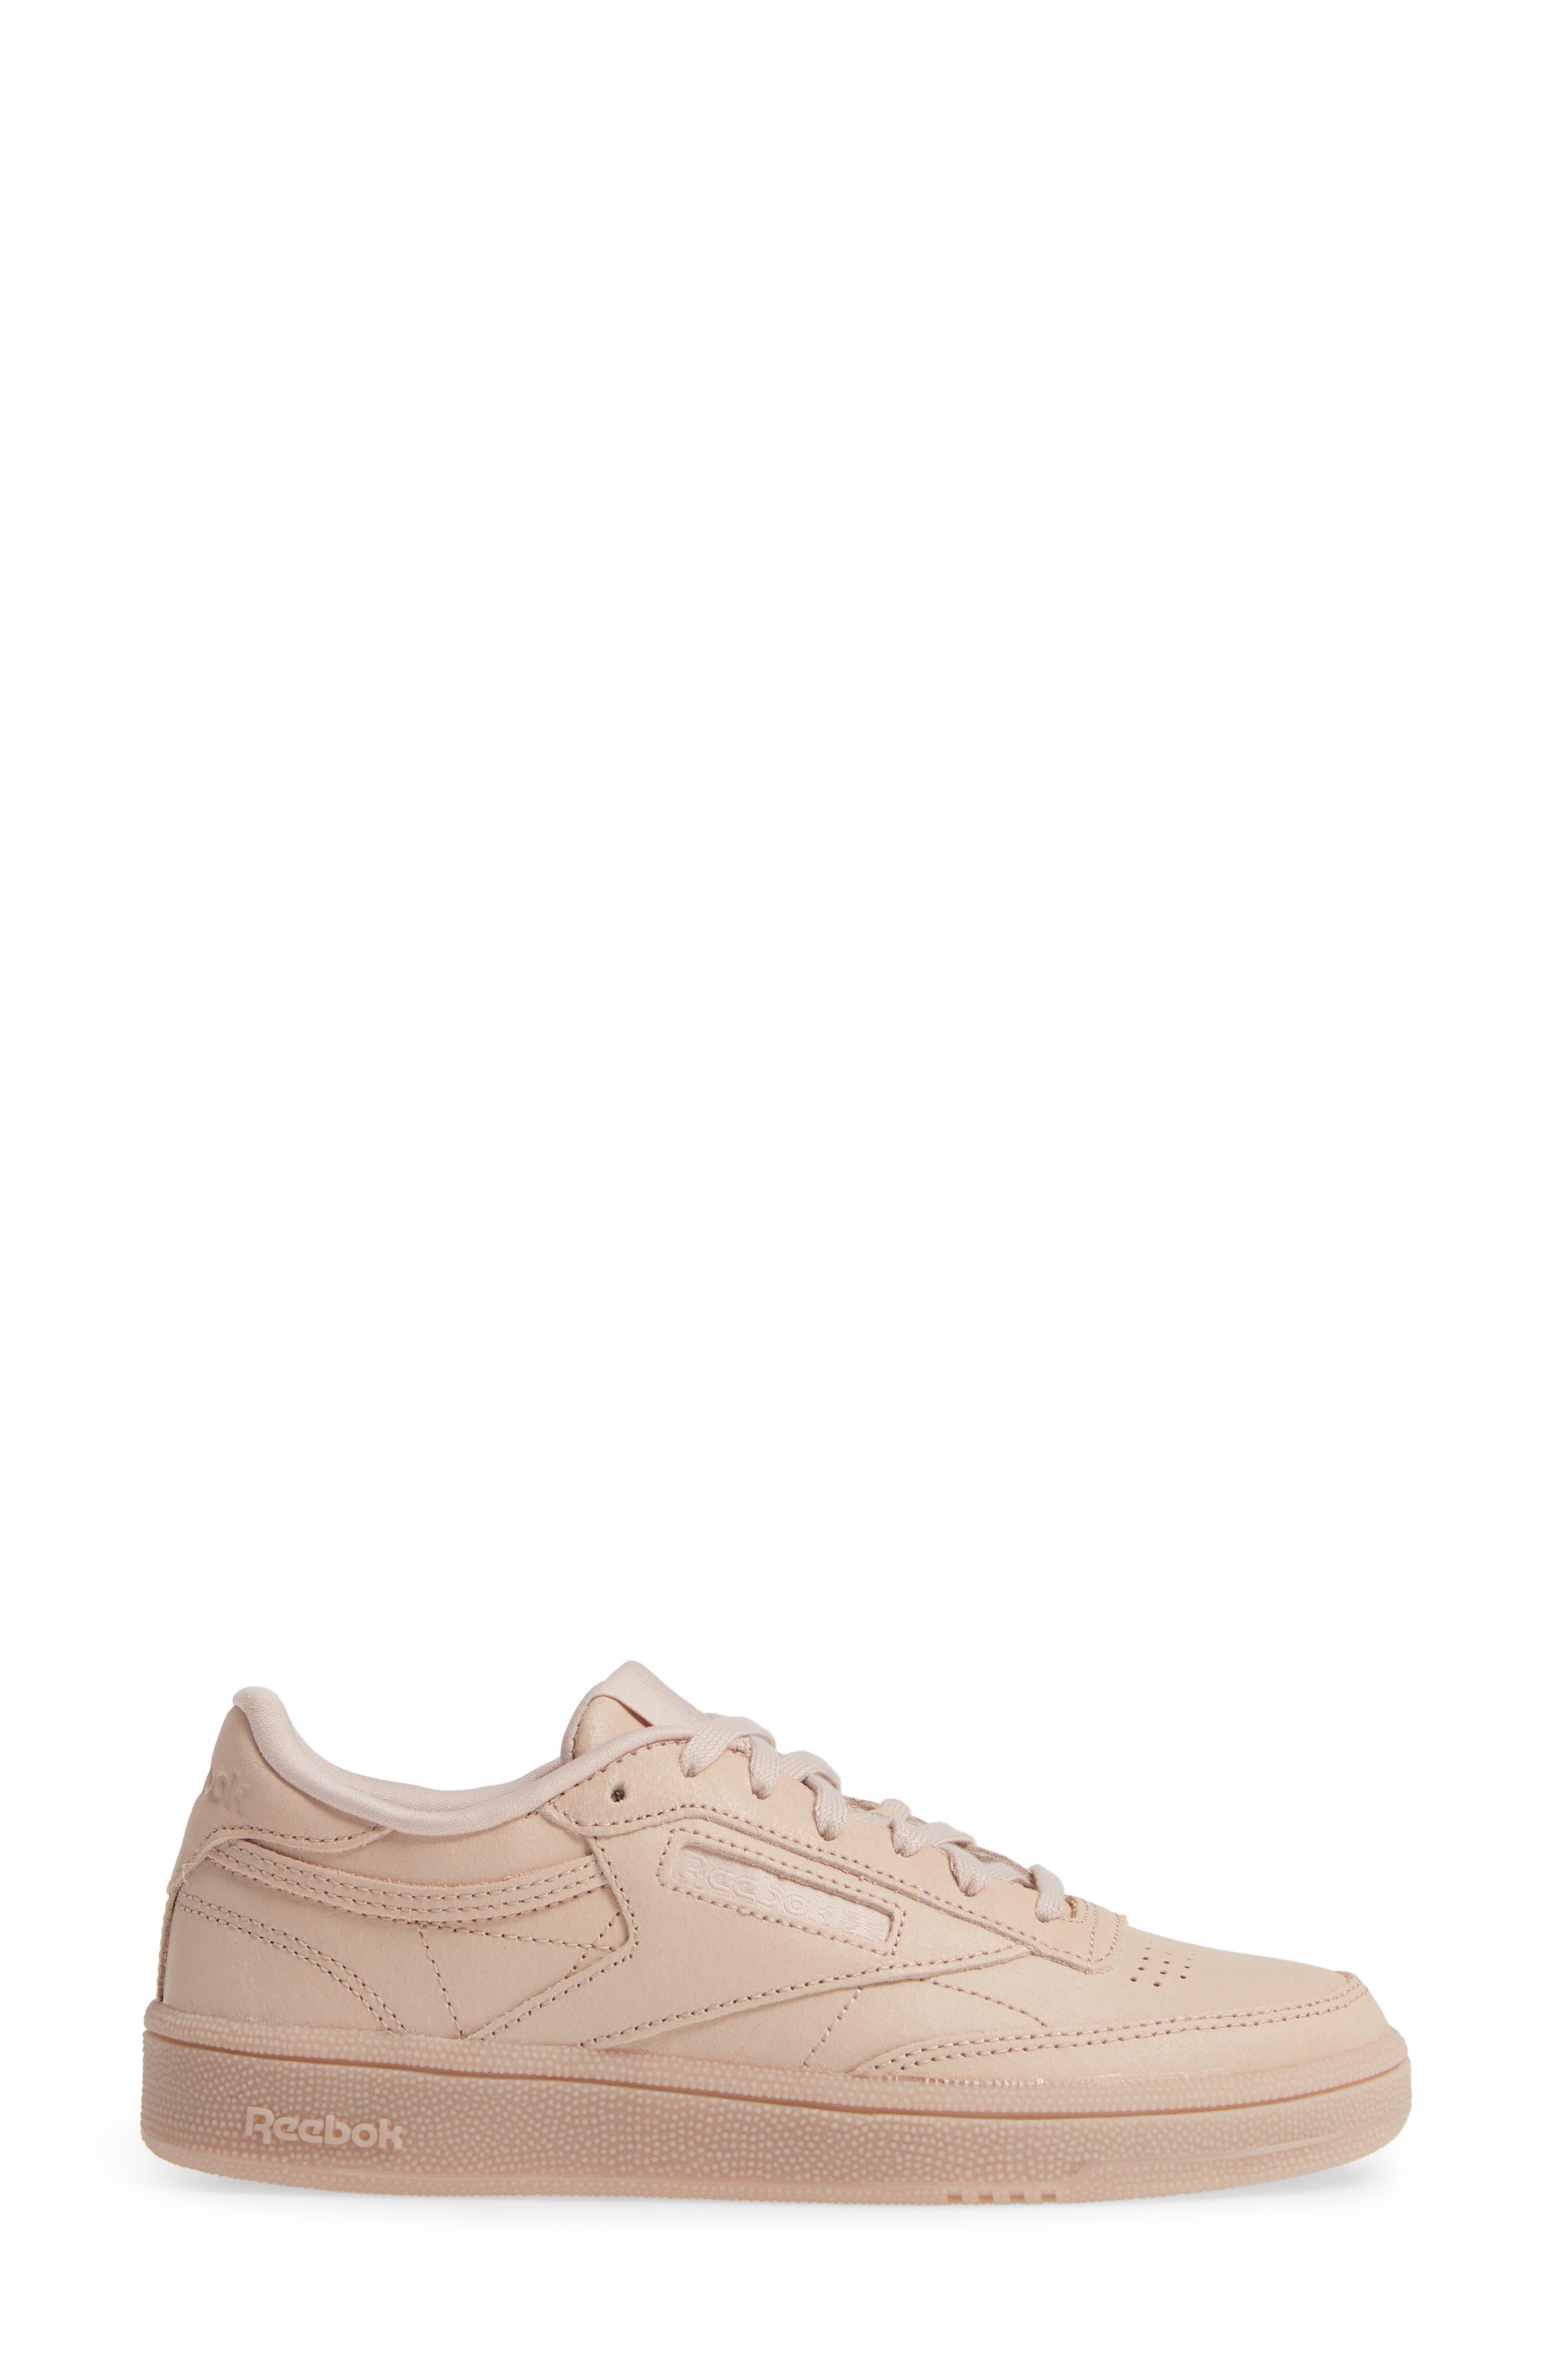 Club C 85 Sneaker,                             Alternate thumbnail 3, color,                             BARE BEIGE/ WHITE